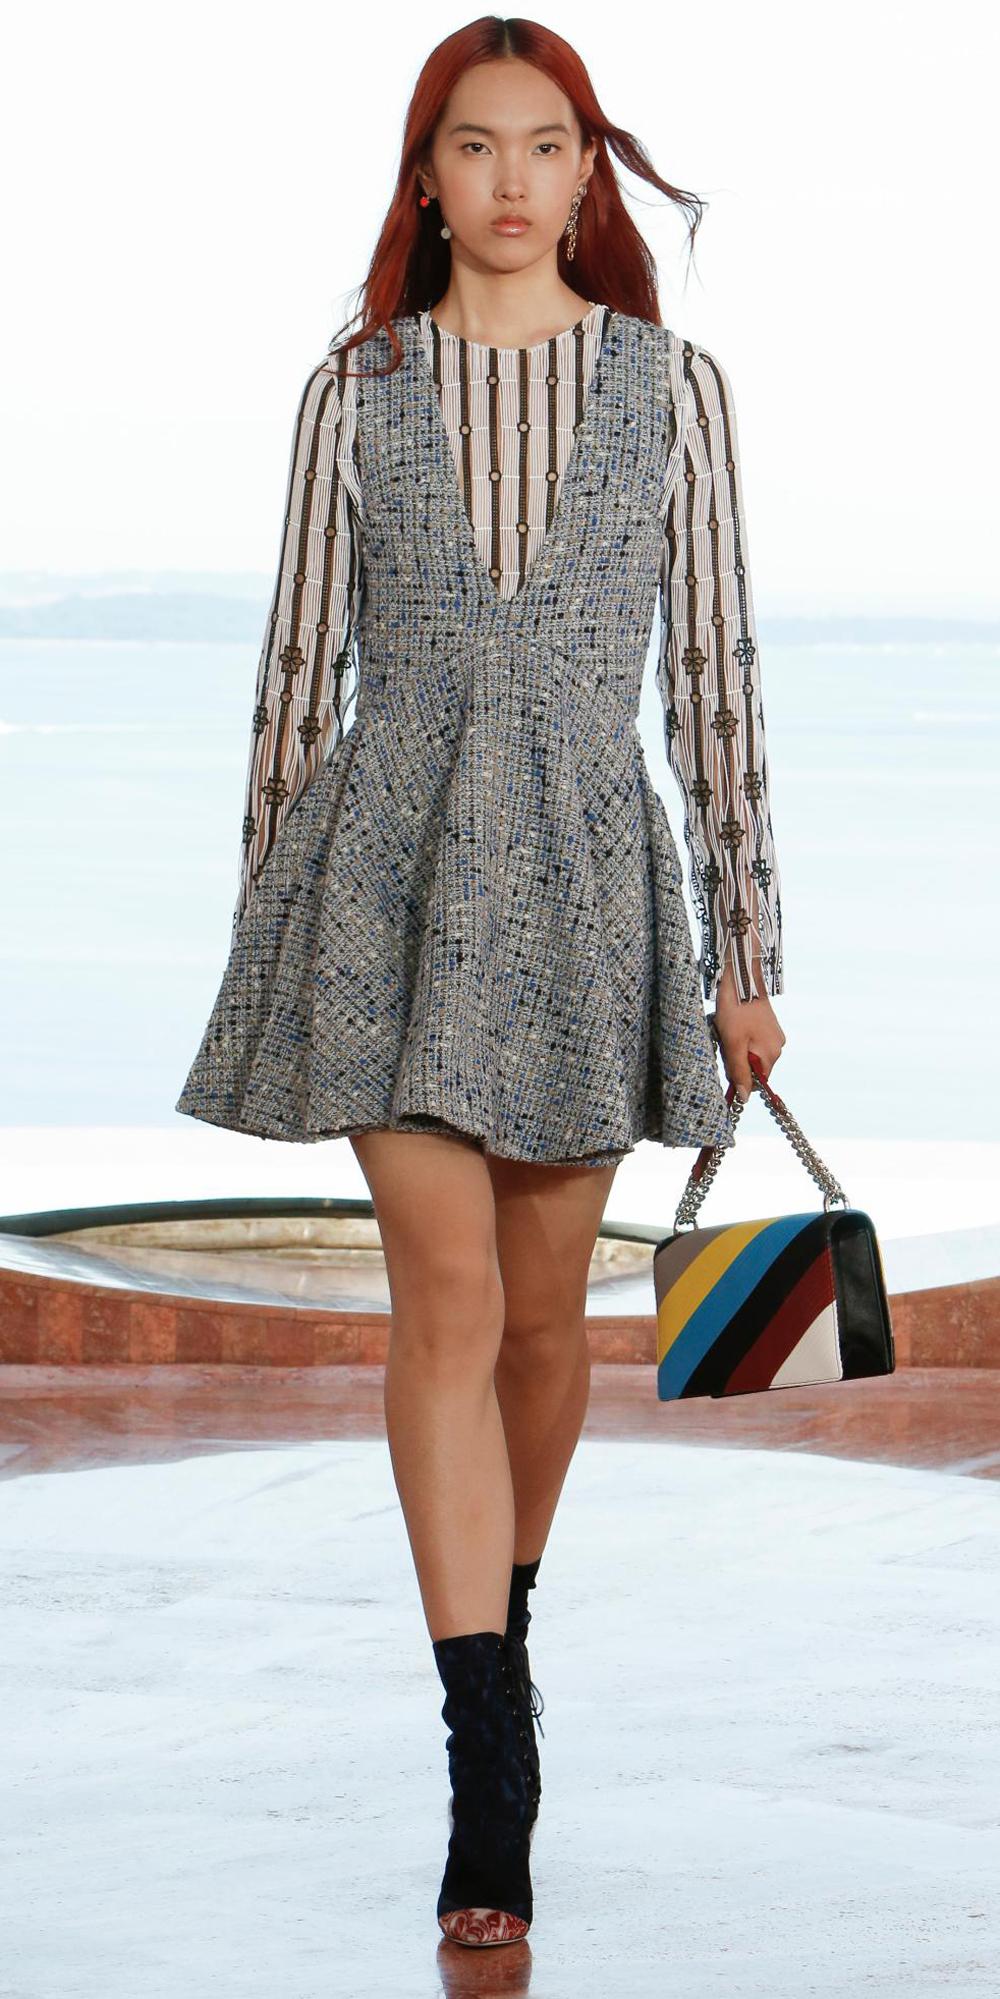 Abbey Lee Joins The Rainbow Hued Model Crew Again